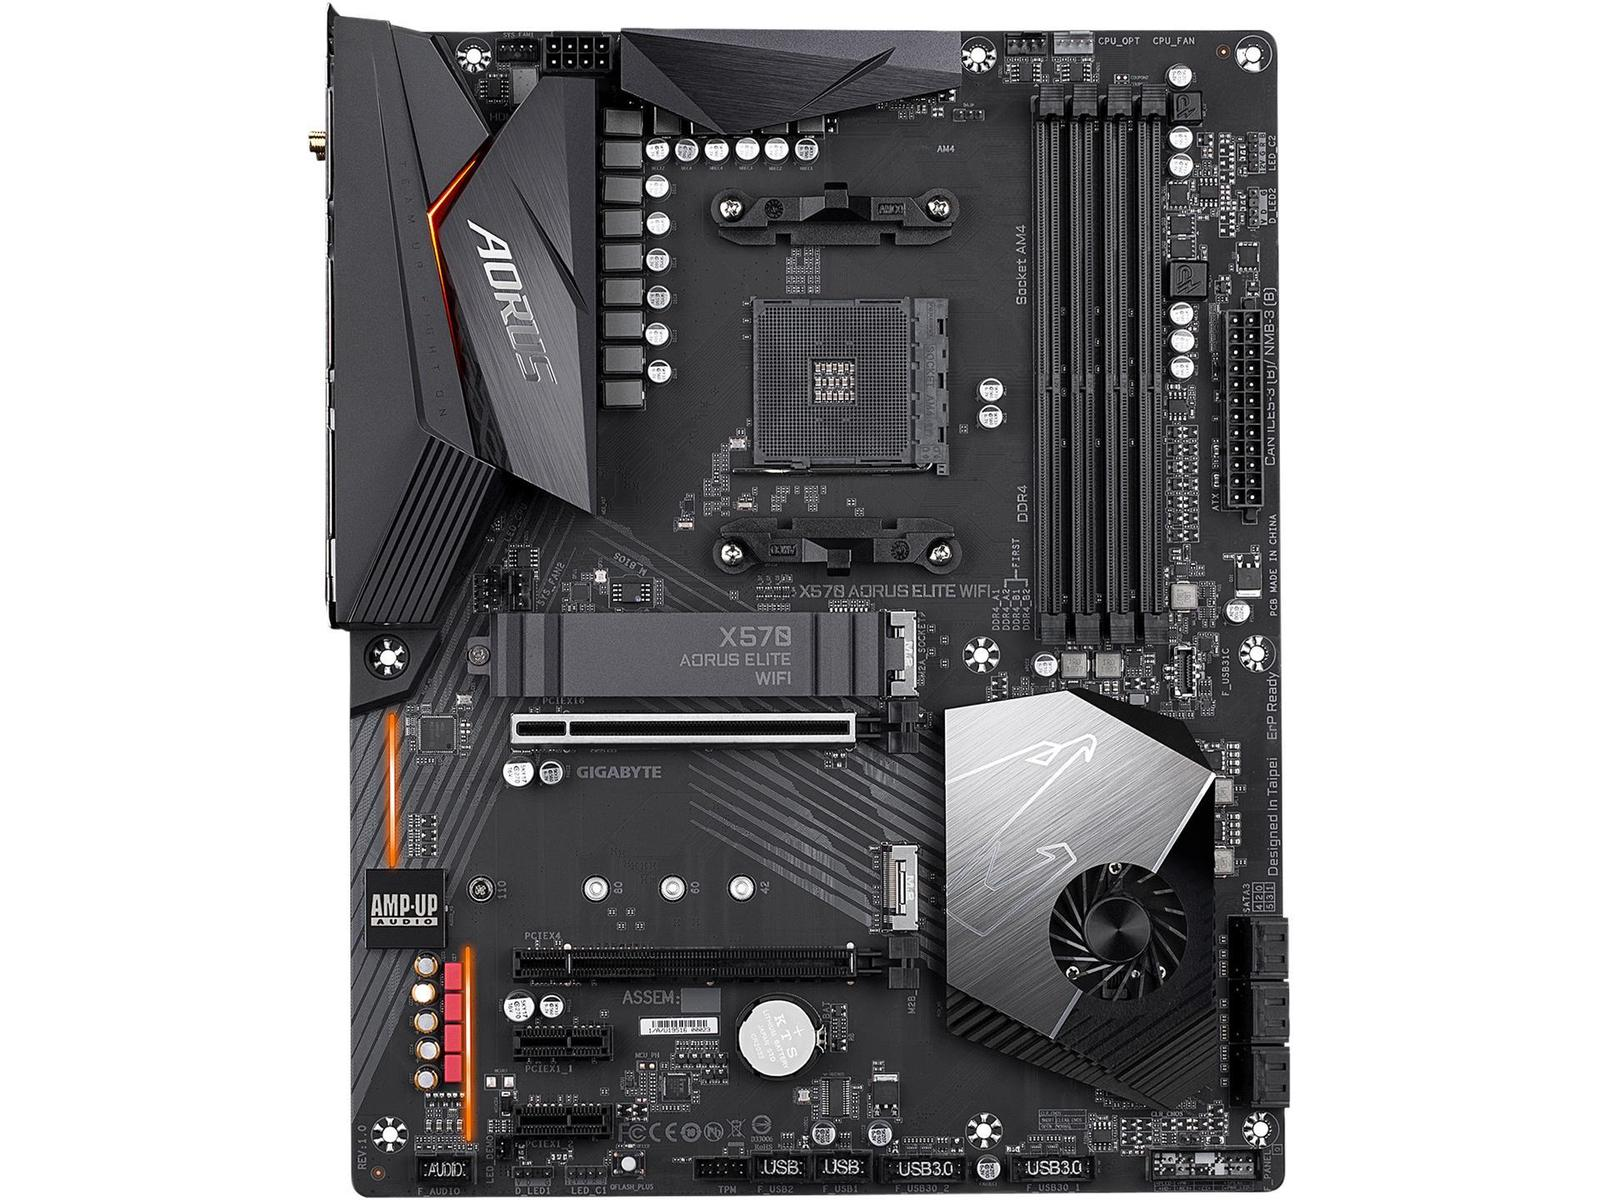 Gigabyte X570 AORUS ELITE WIFI ATX AM4 Motherboard